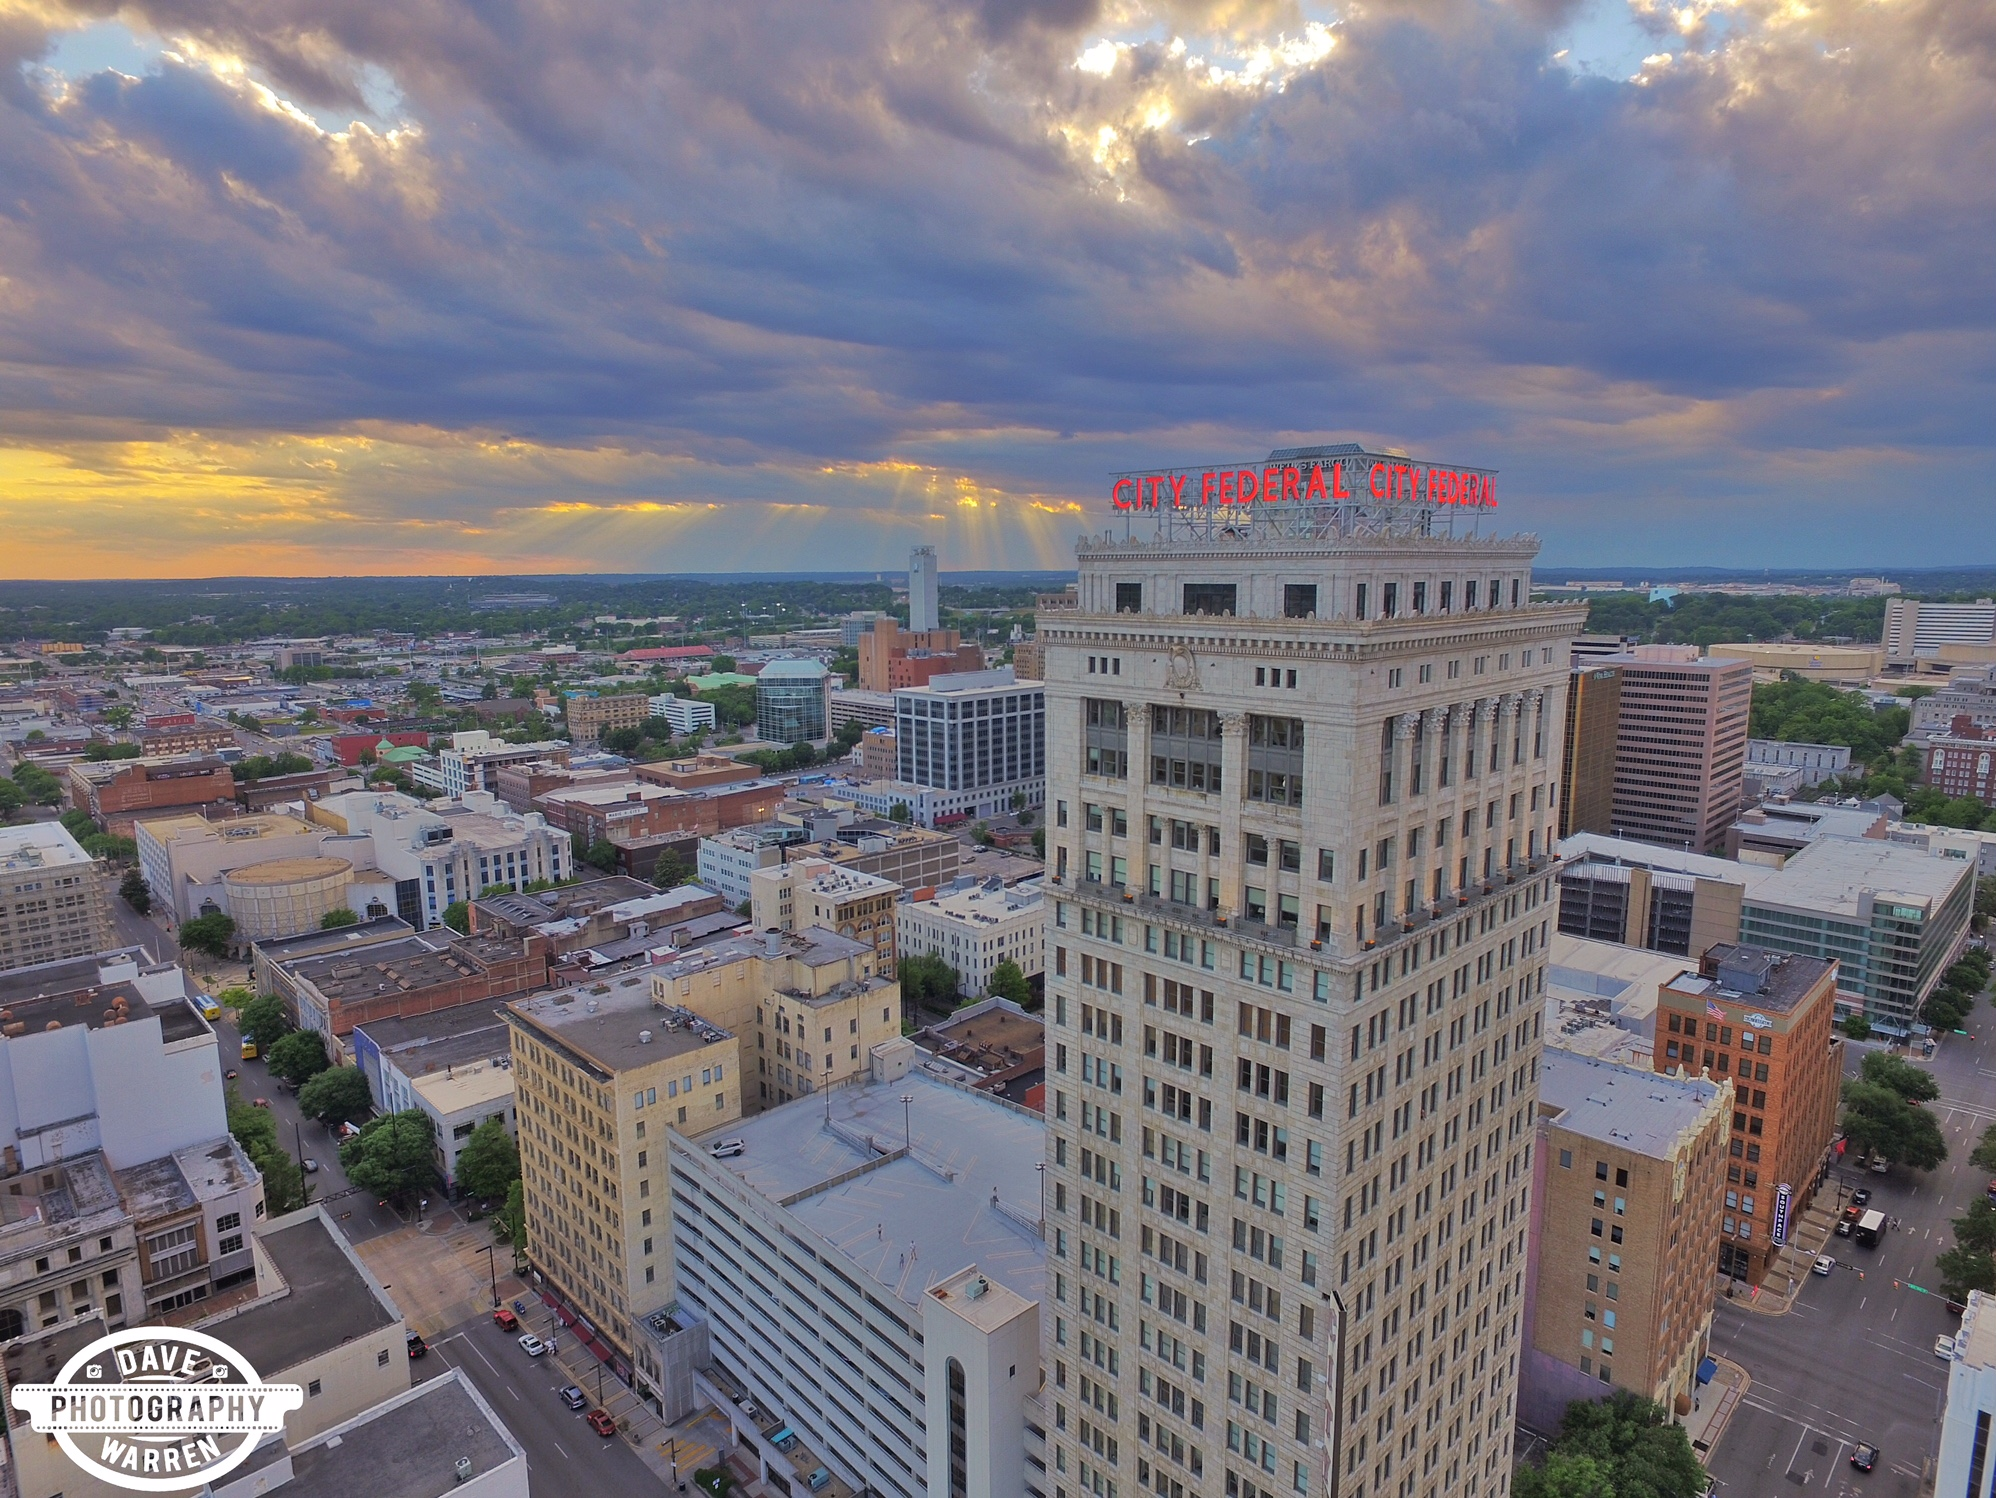 City Federal Birmingham Alabama Aerial Photography